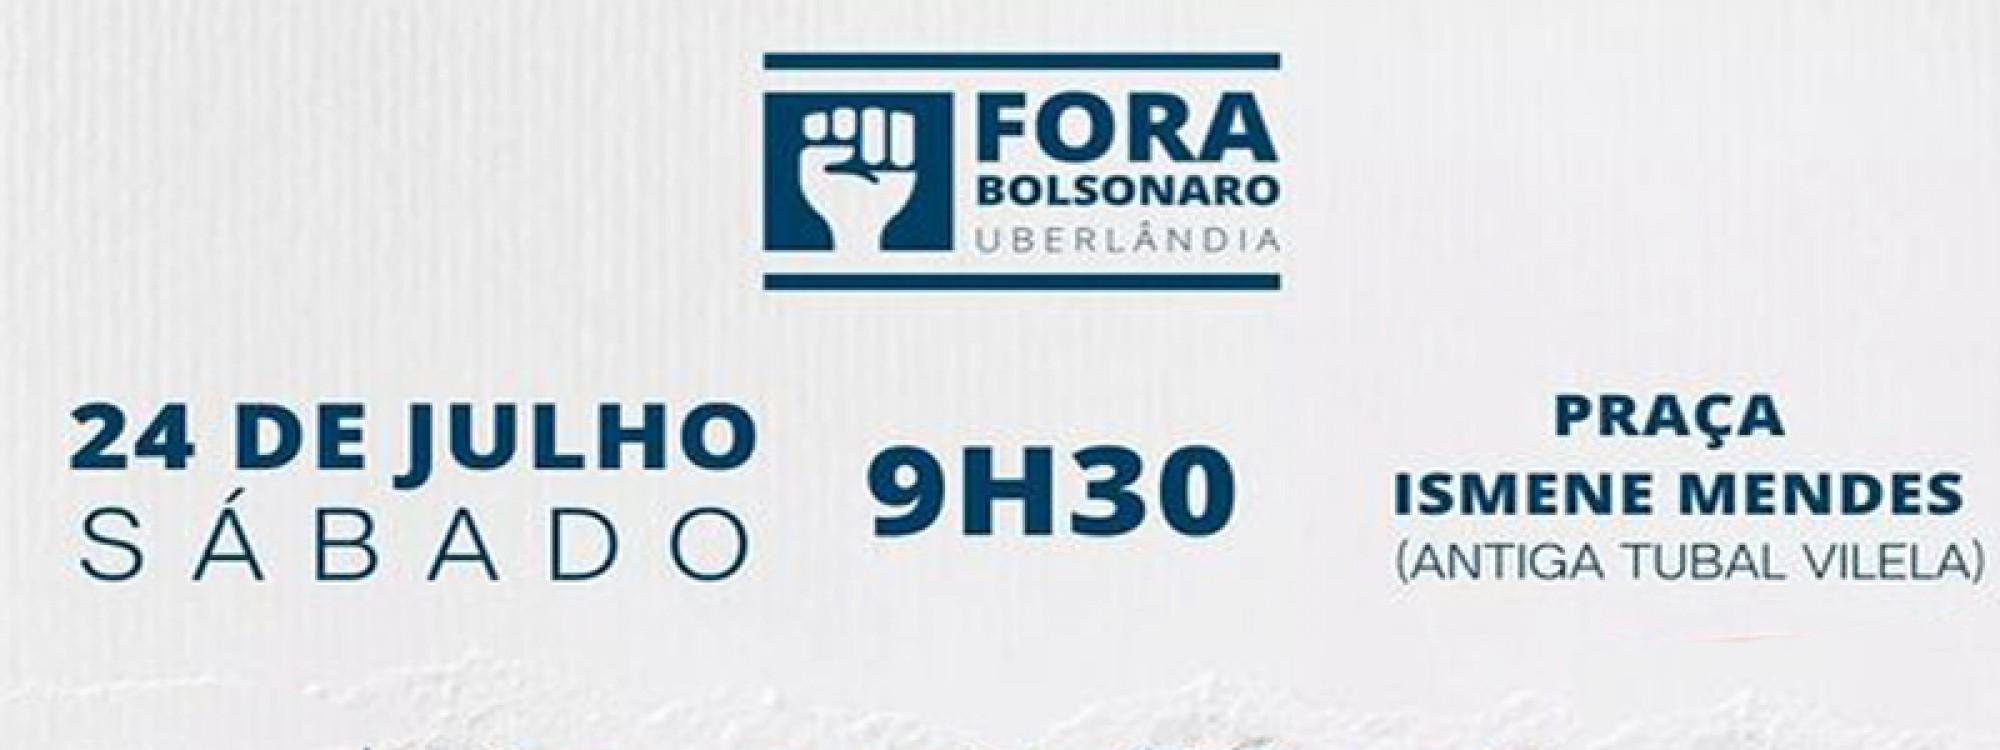 #24J - Uberlândia nas ruas pelo Fora Bolsonaro!